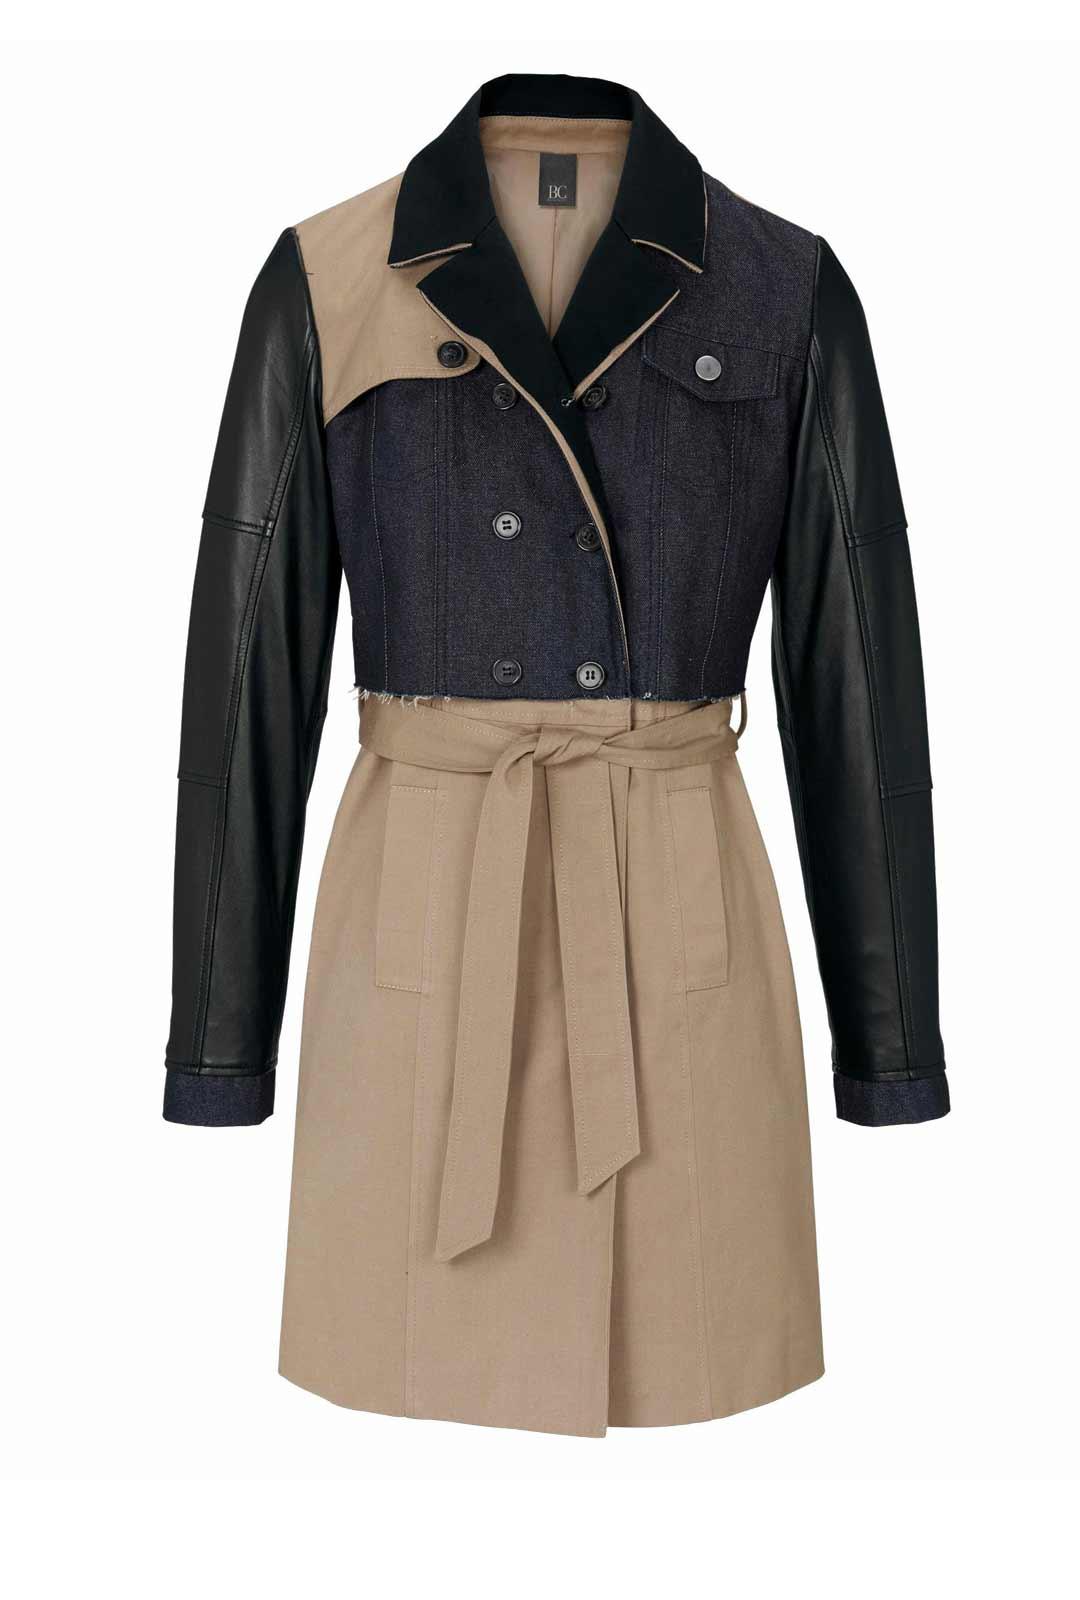 Damen Trenchcoat Beige Schwarz Mantel Damen Kurzmantel Damen Frühjahr Sommer